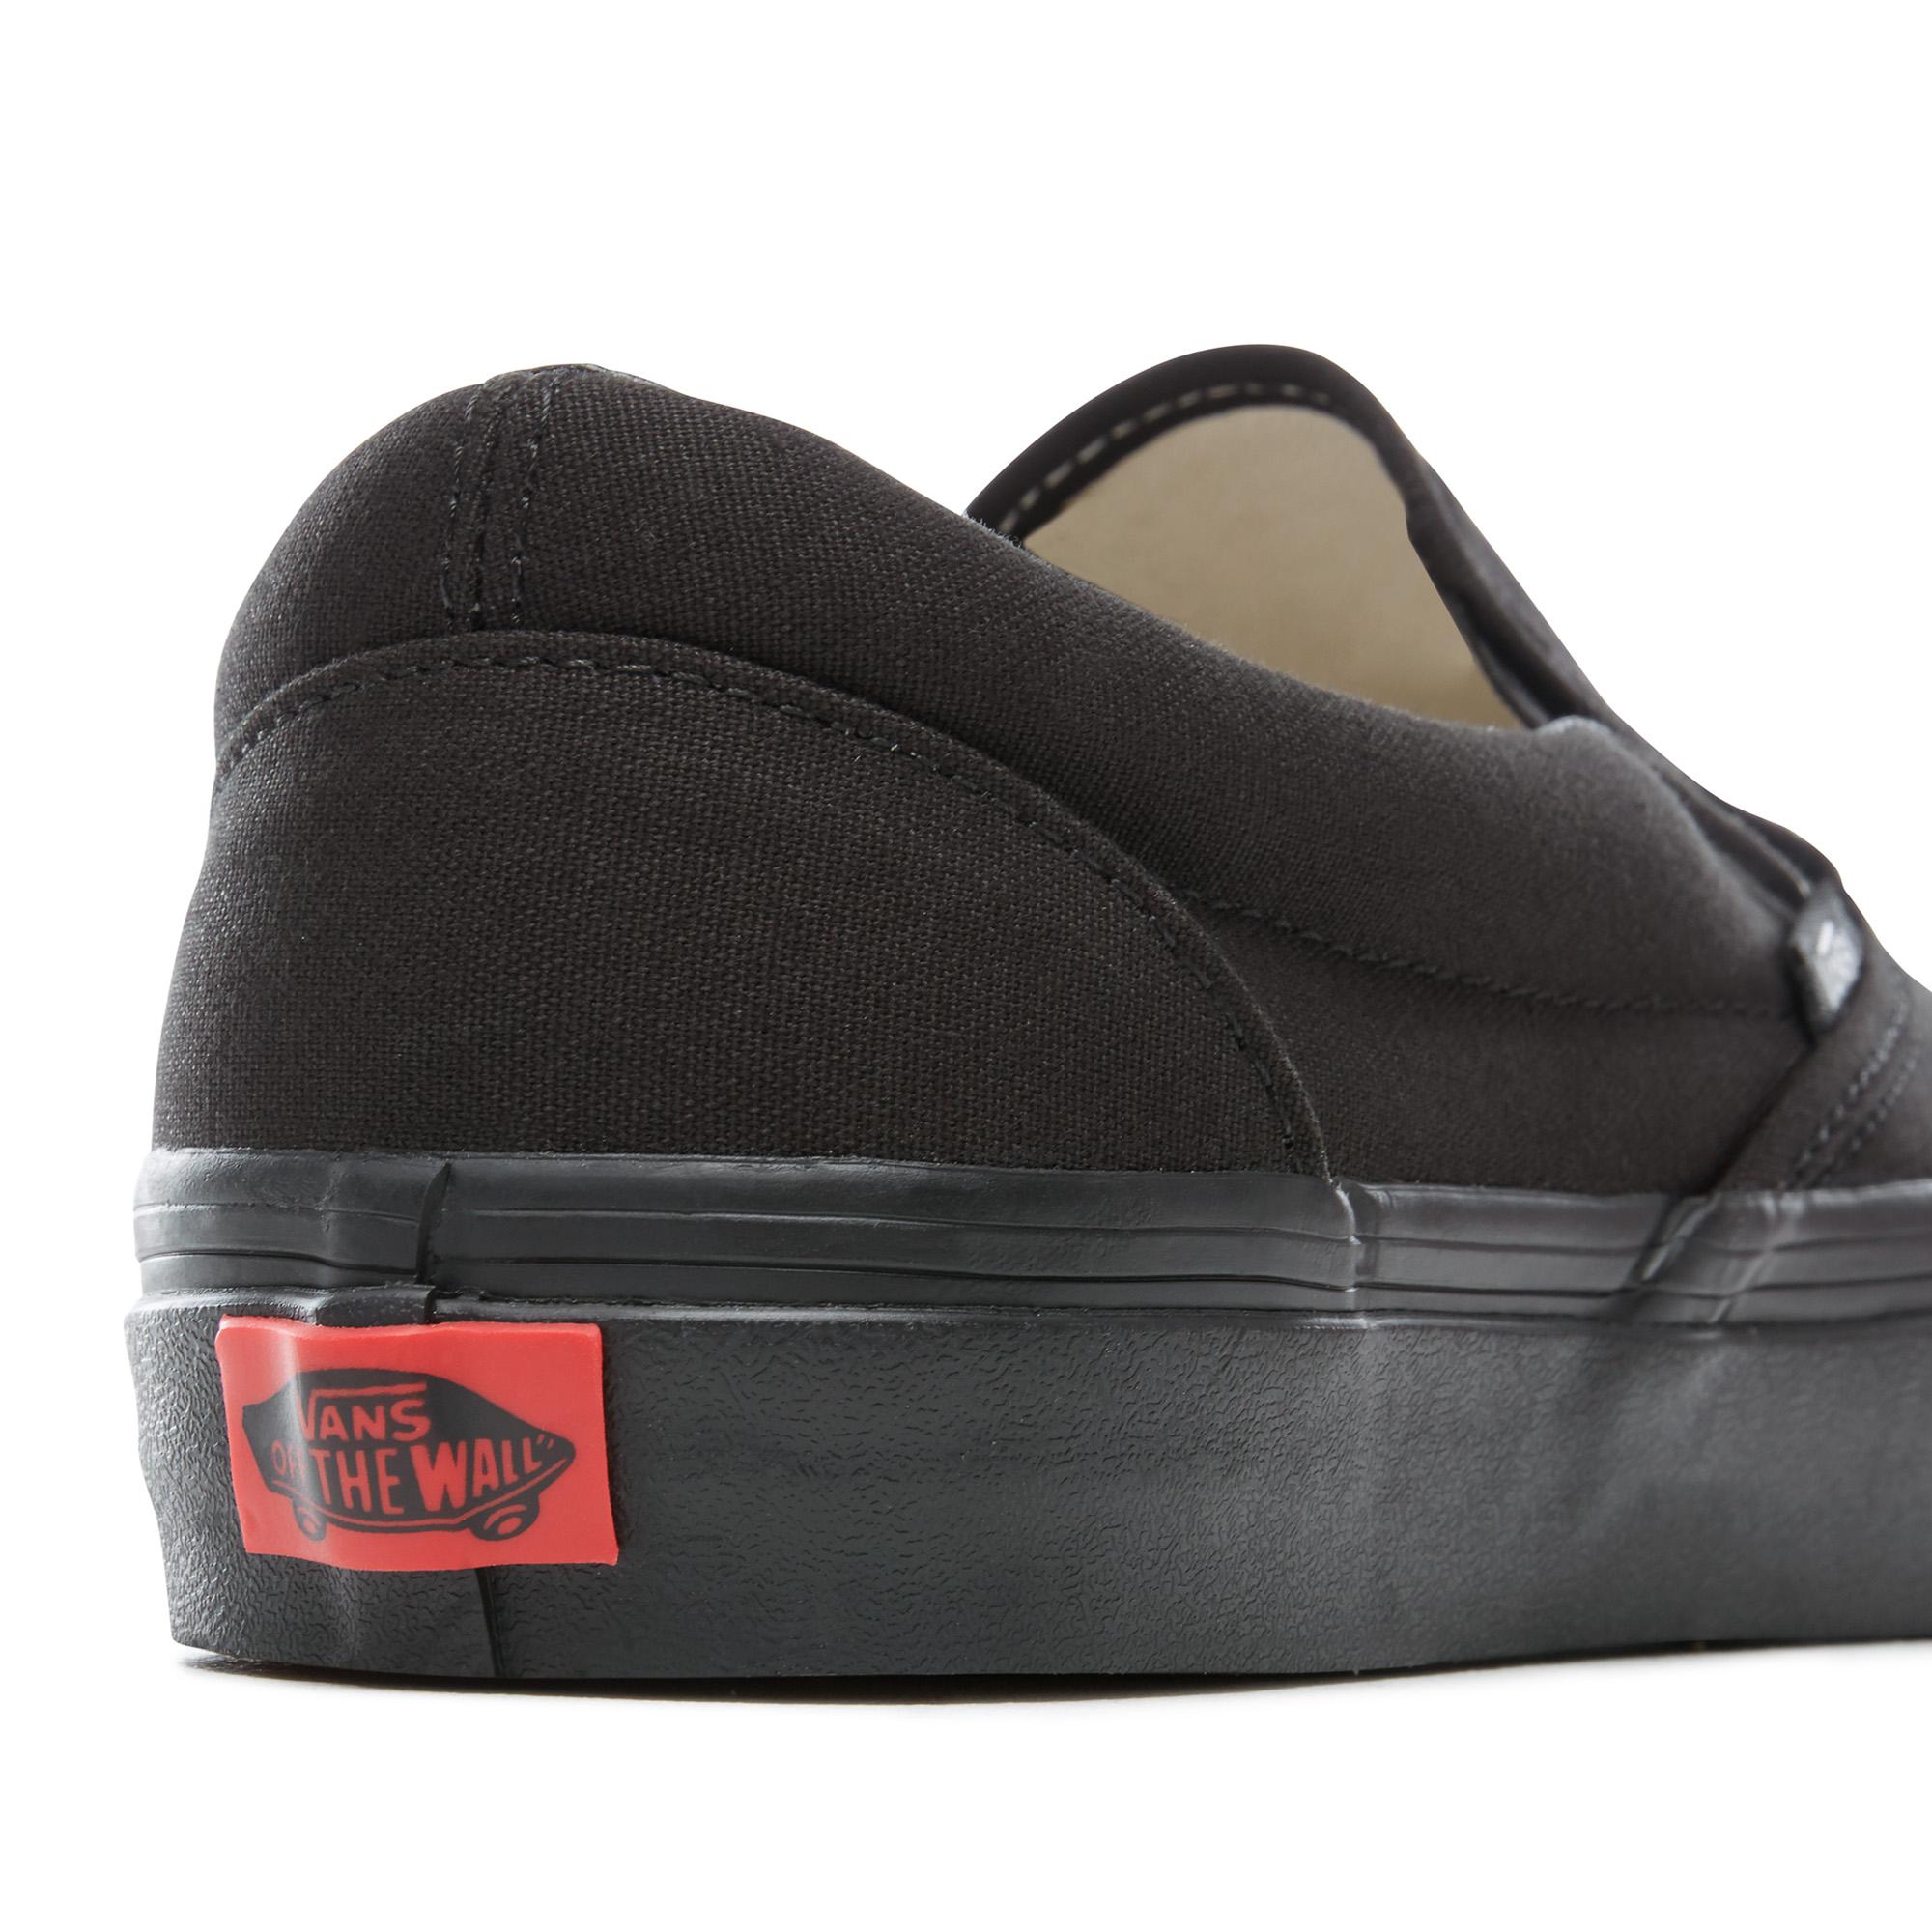 Vans classic slip on sko, black, 44